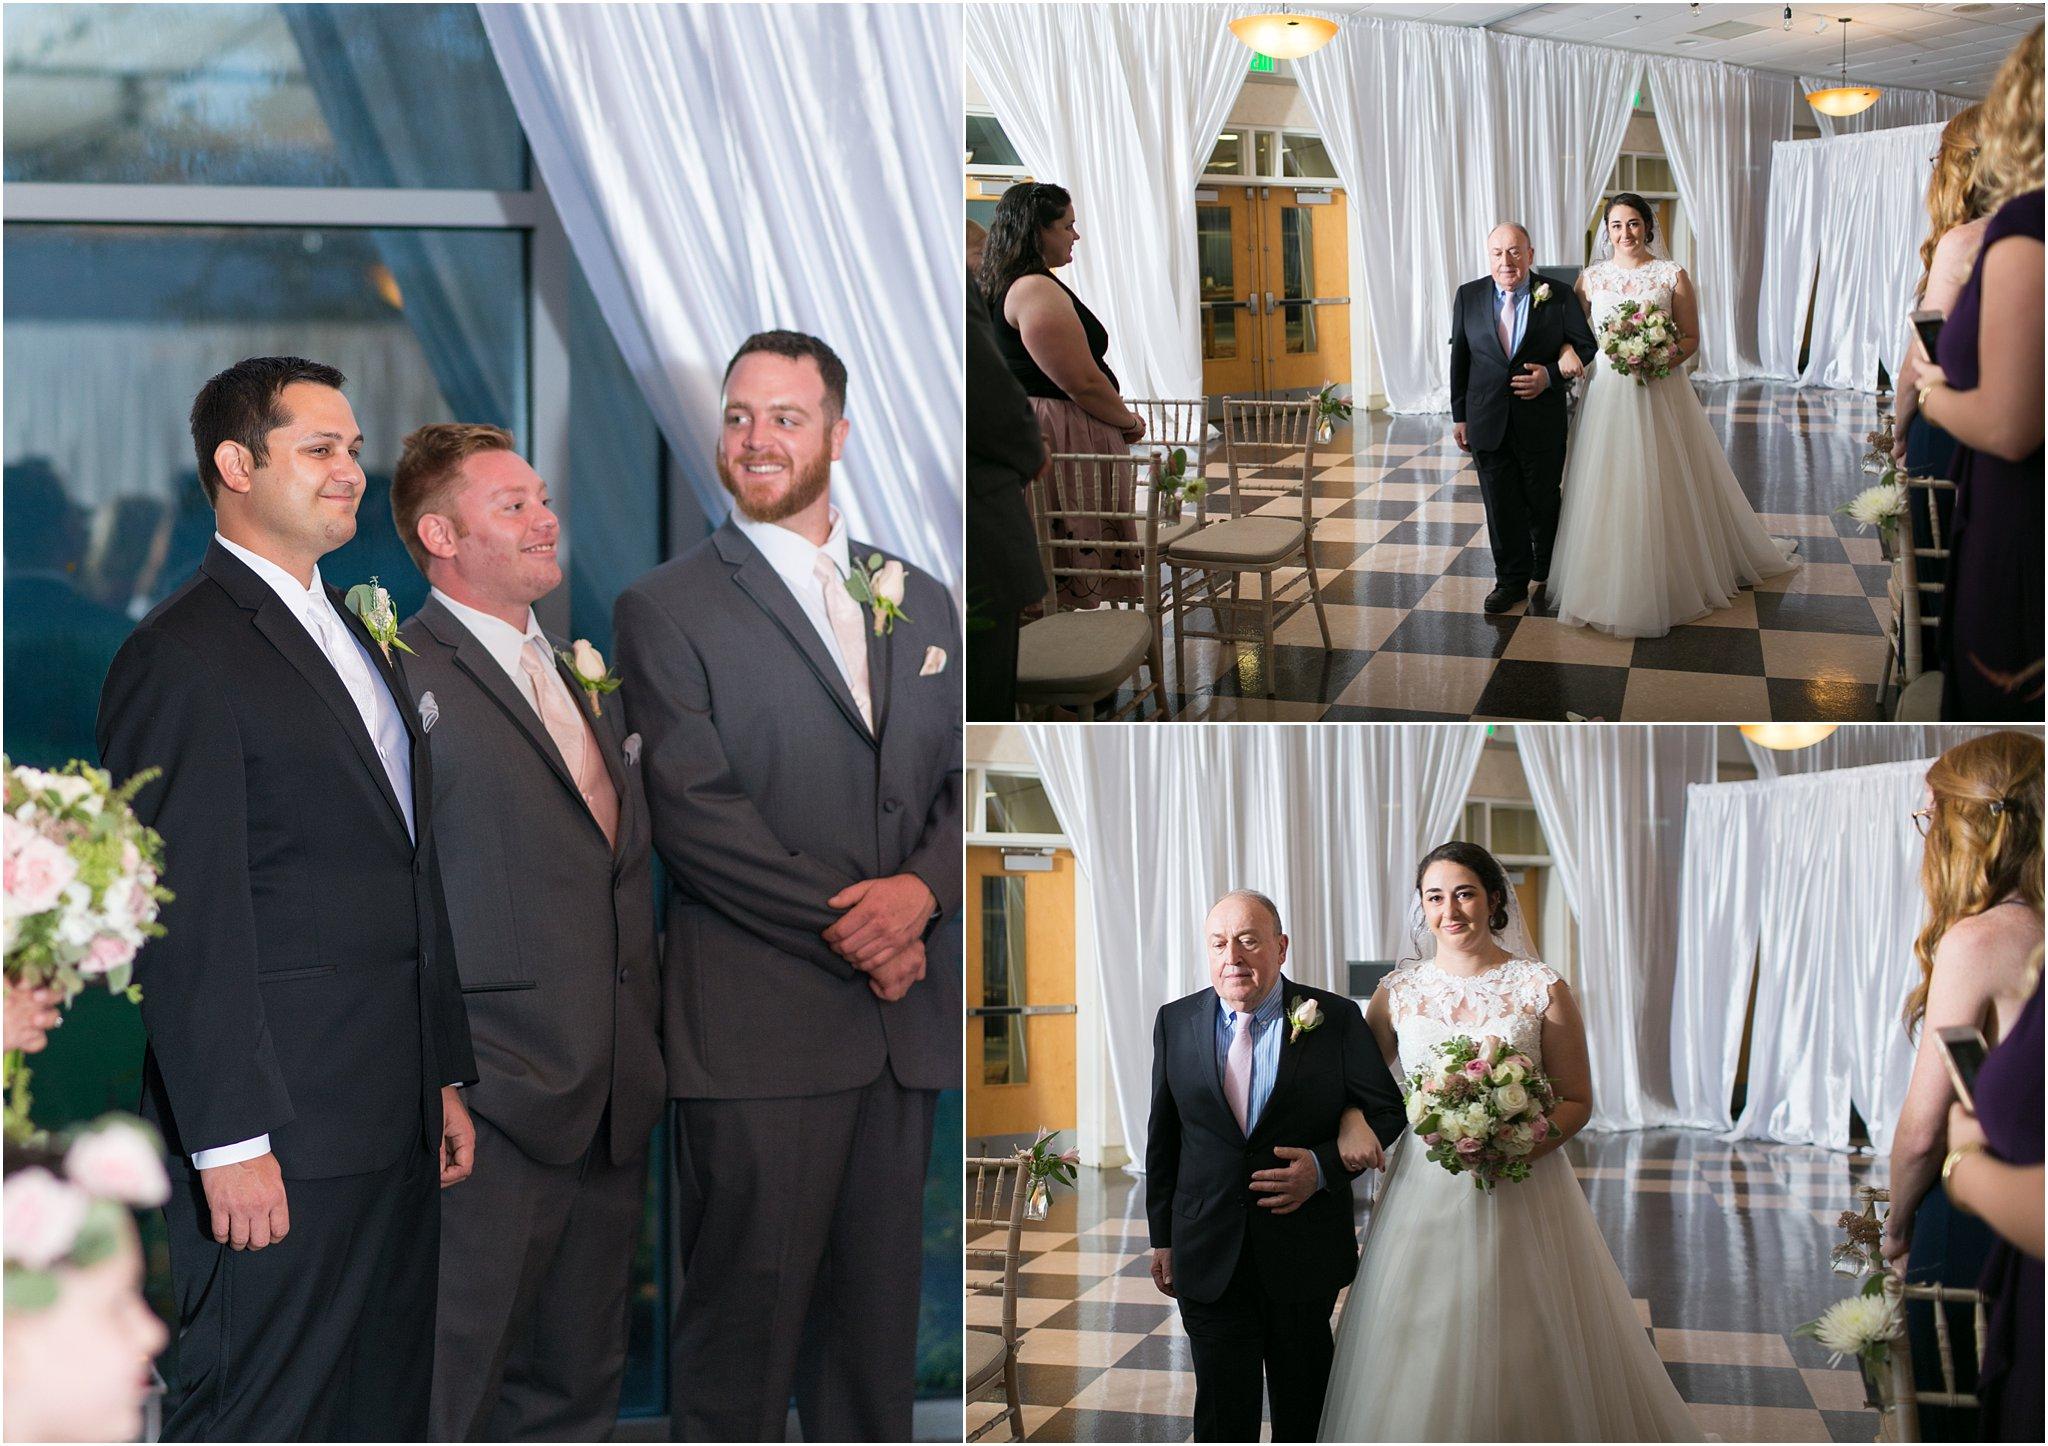 jessica_ryan_photography_virginia_wedding_photographer_wedding_hurricane_norfolk_botanical_gardens_hurricane_matthew_wedding_3588